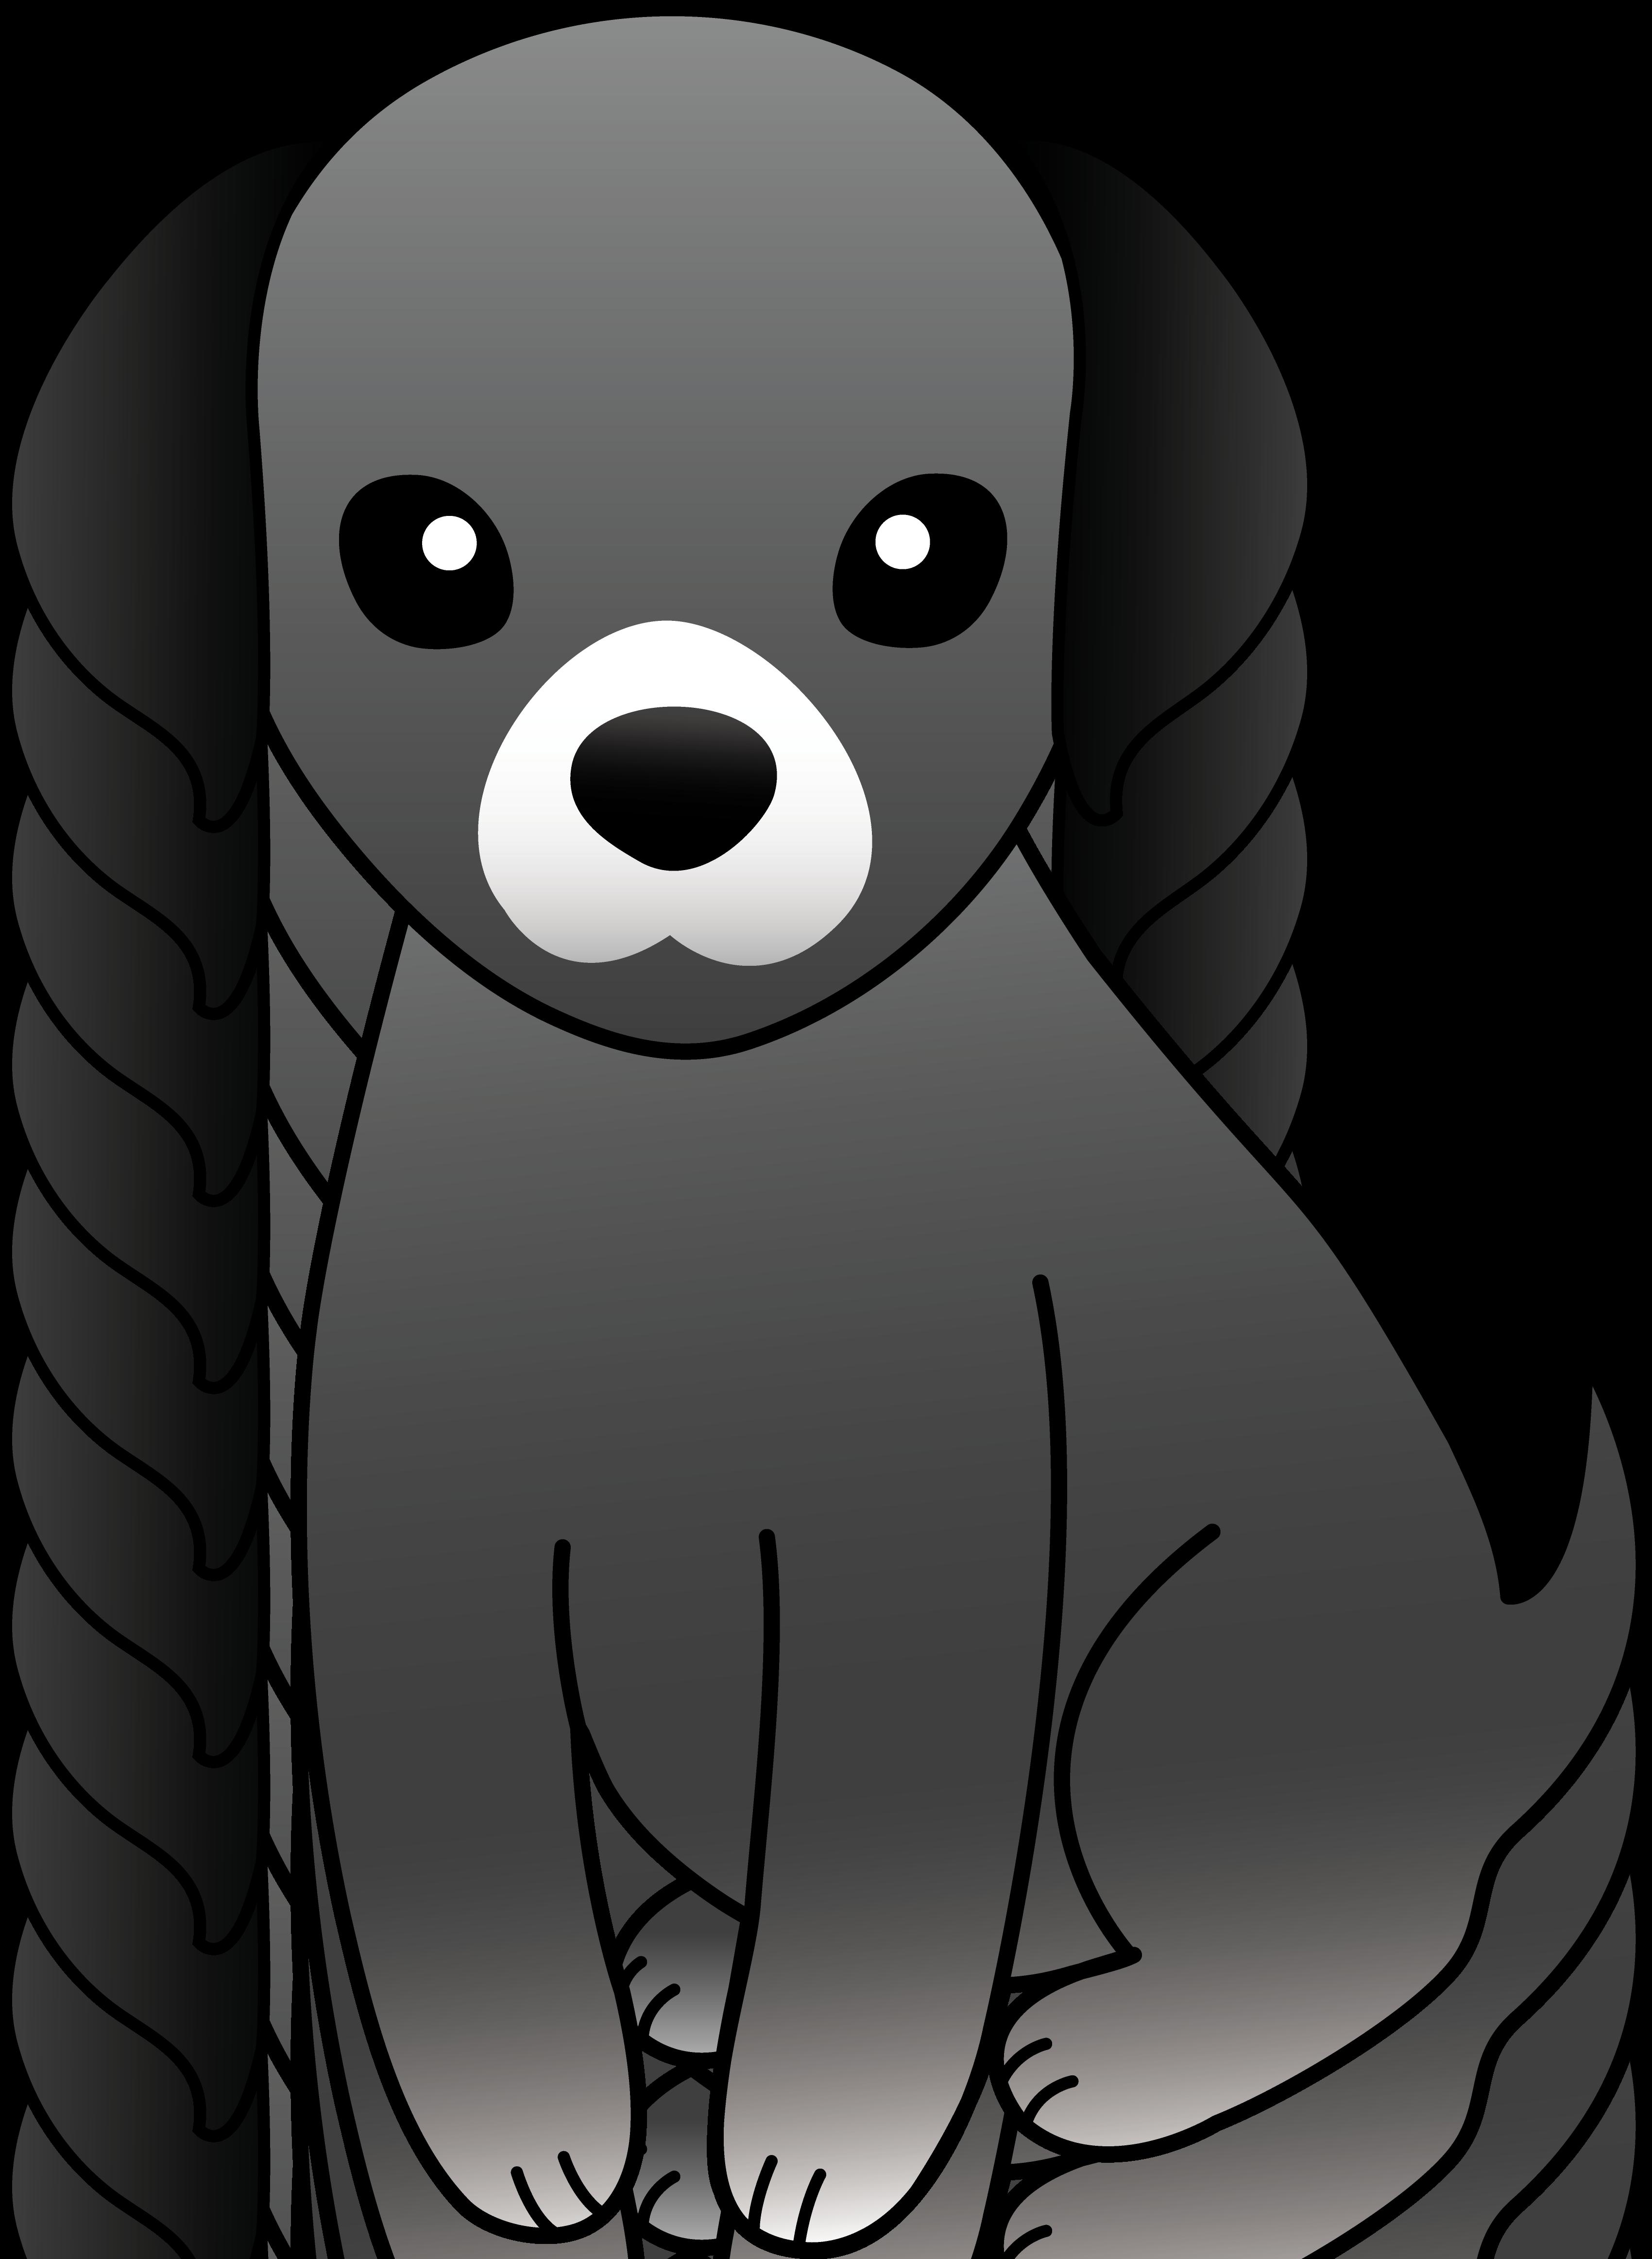 Small Black Dog Clipart.